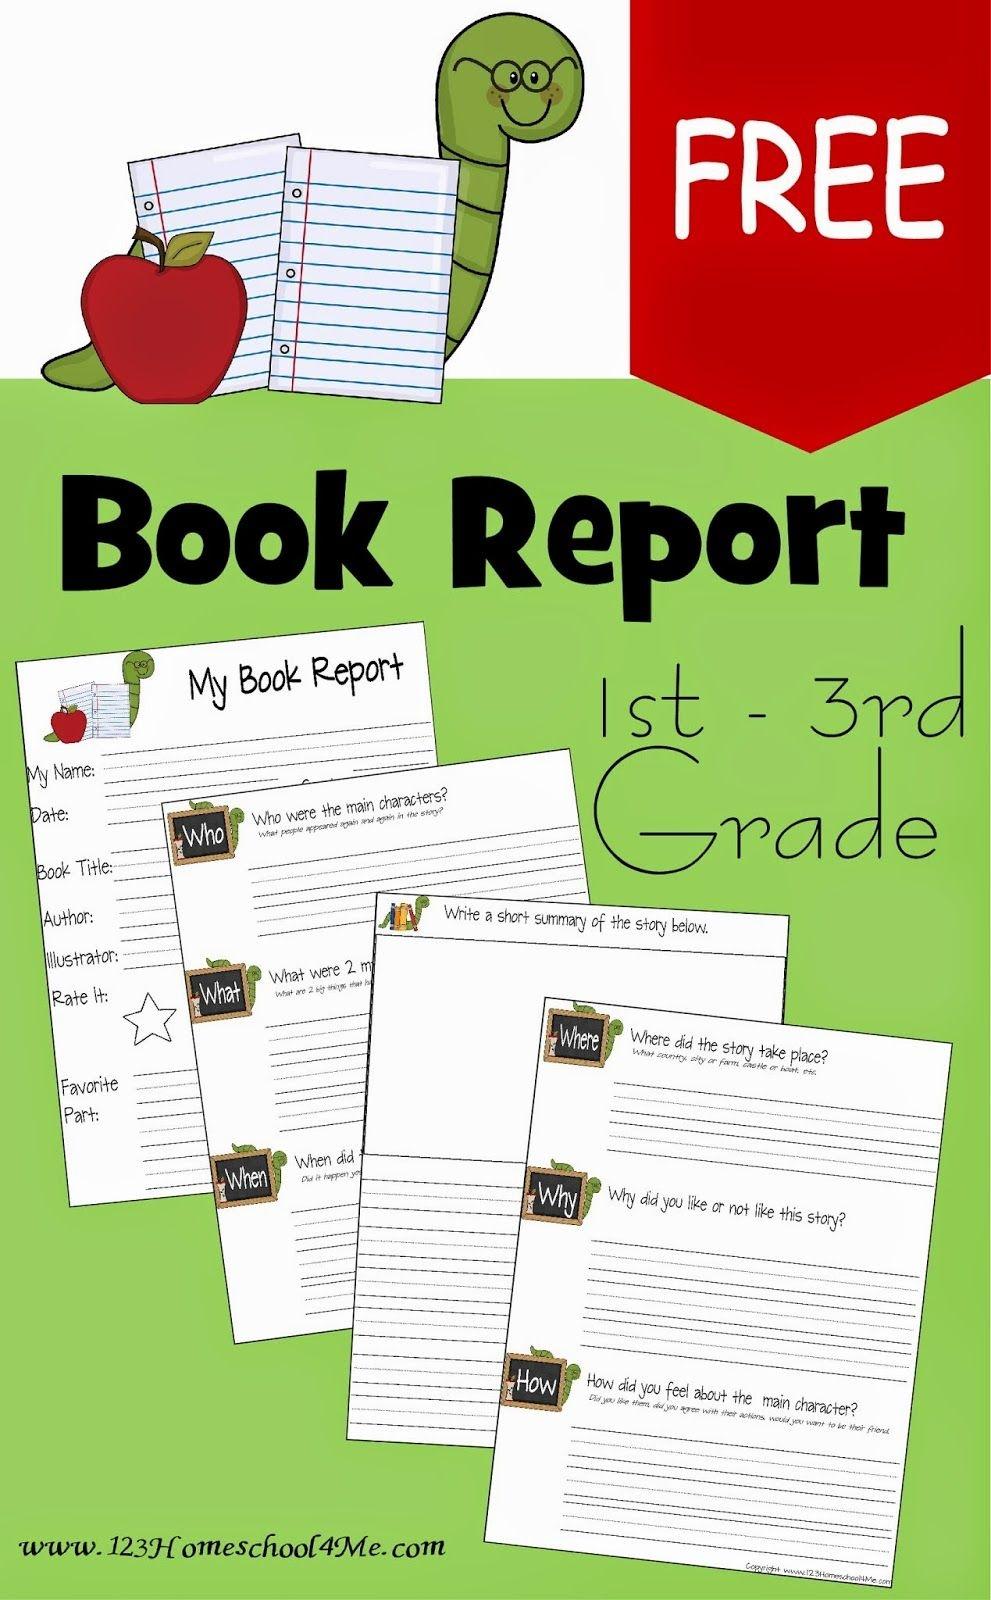 Free Book Report Template | School | 1St Grade Books, 3Rd Grade - Free Printable Book Report Forms For Second Grade